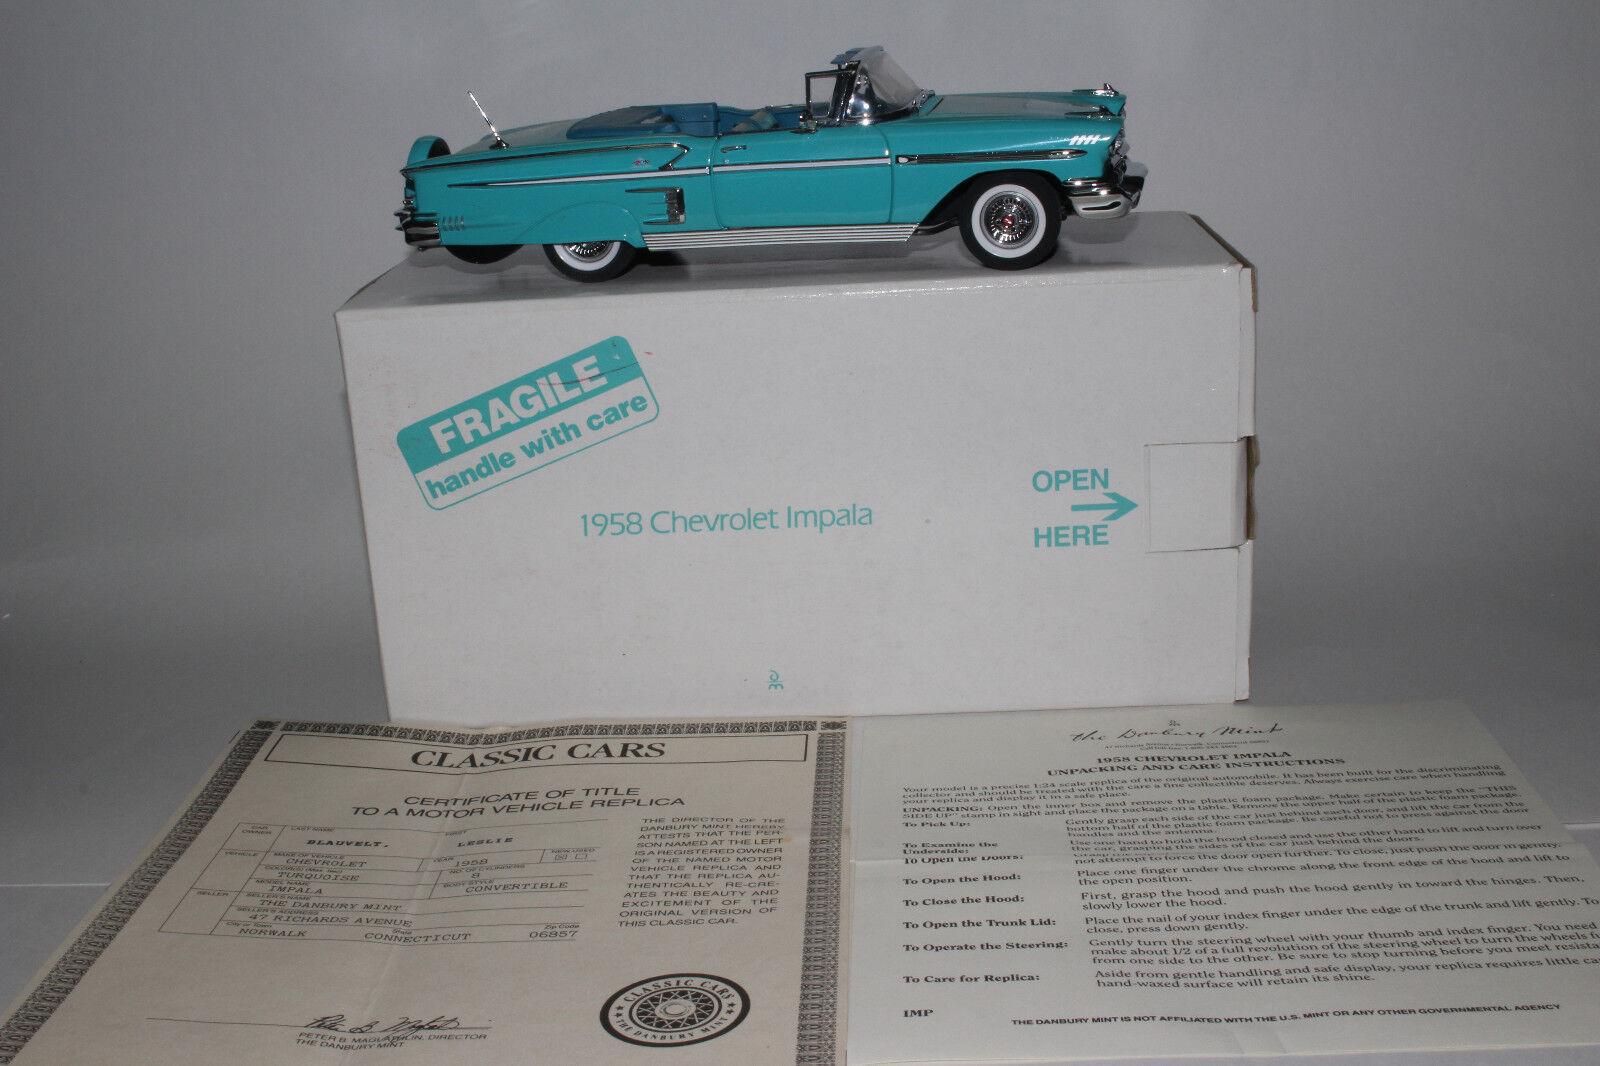 Danbury Menta 1958 Chevrolet Impala Converdeibile, 1 24 Scala Die Cast modellolo